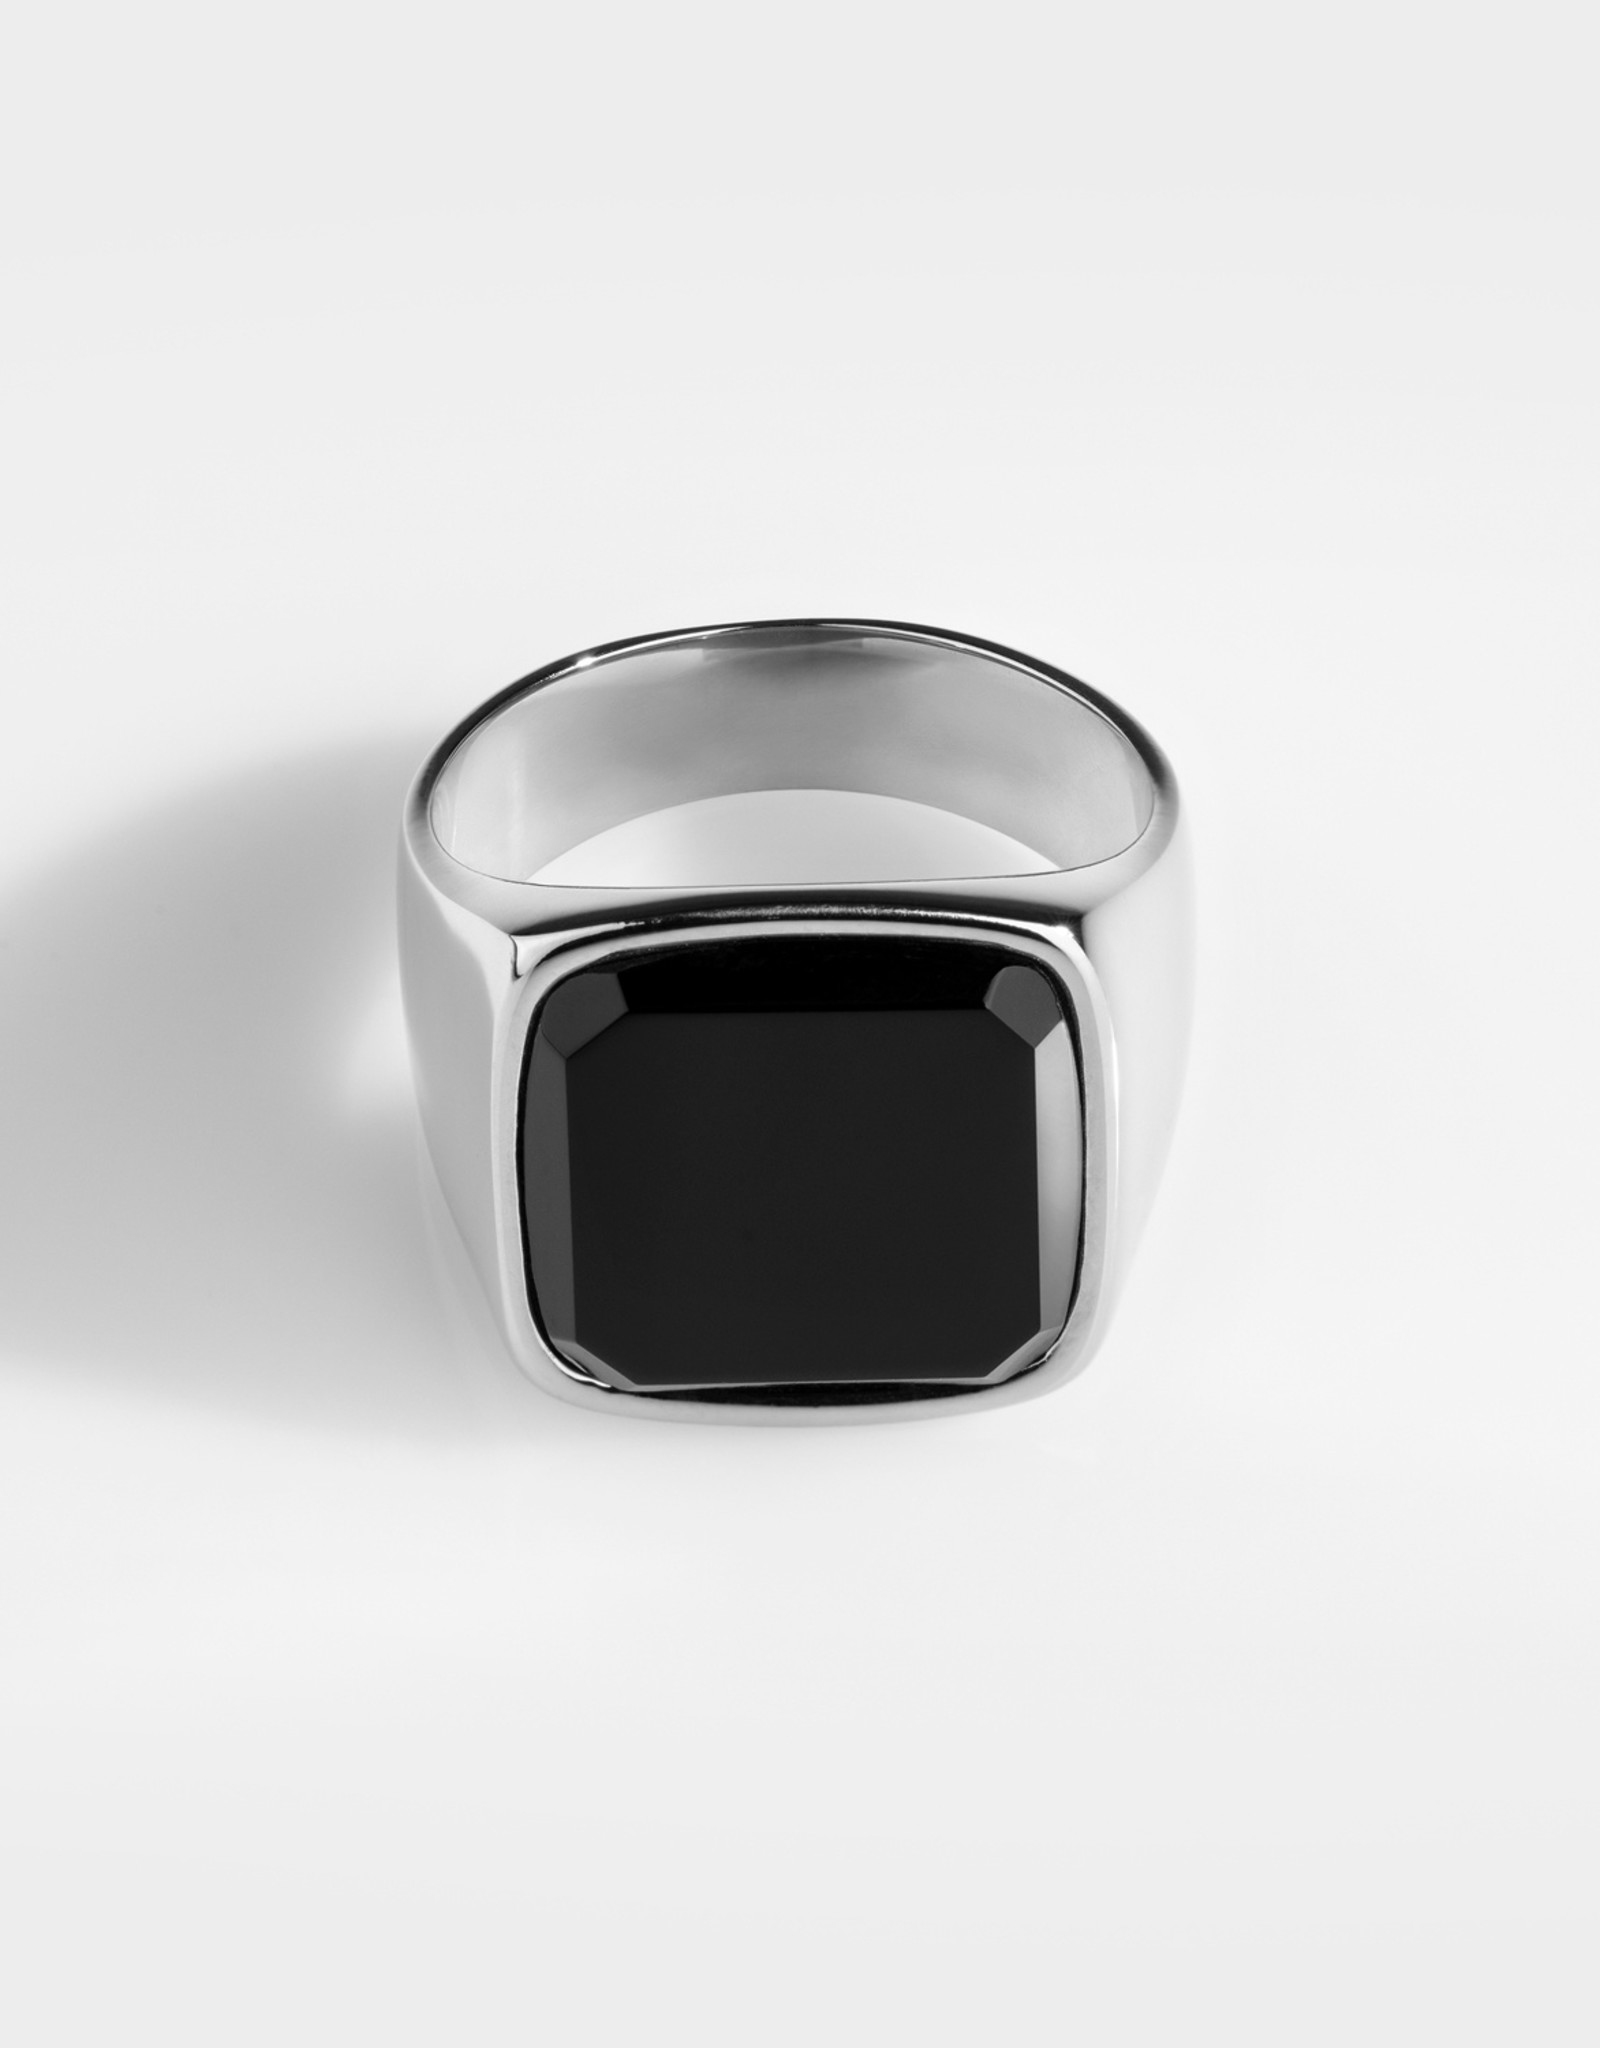 Northern Legacy Black Onyx Oversize Signature - Gold Tone Ring 21